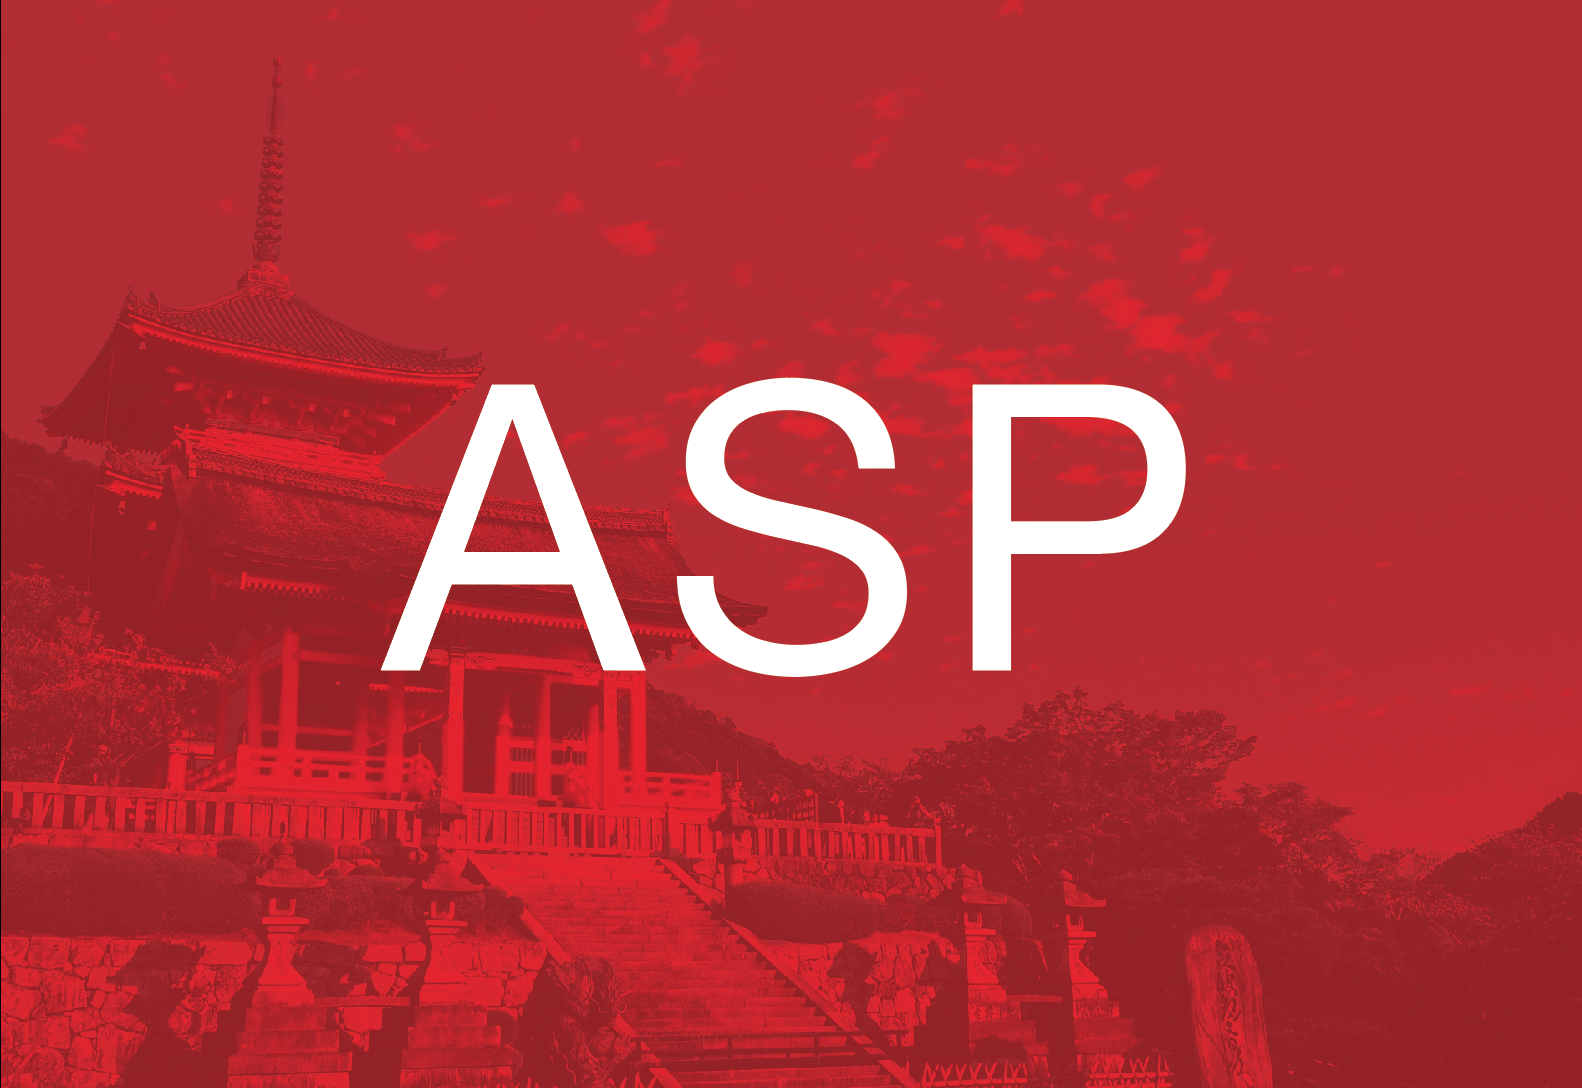 ASP acronym